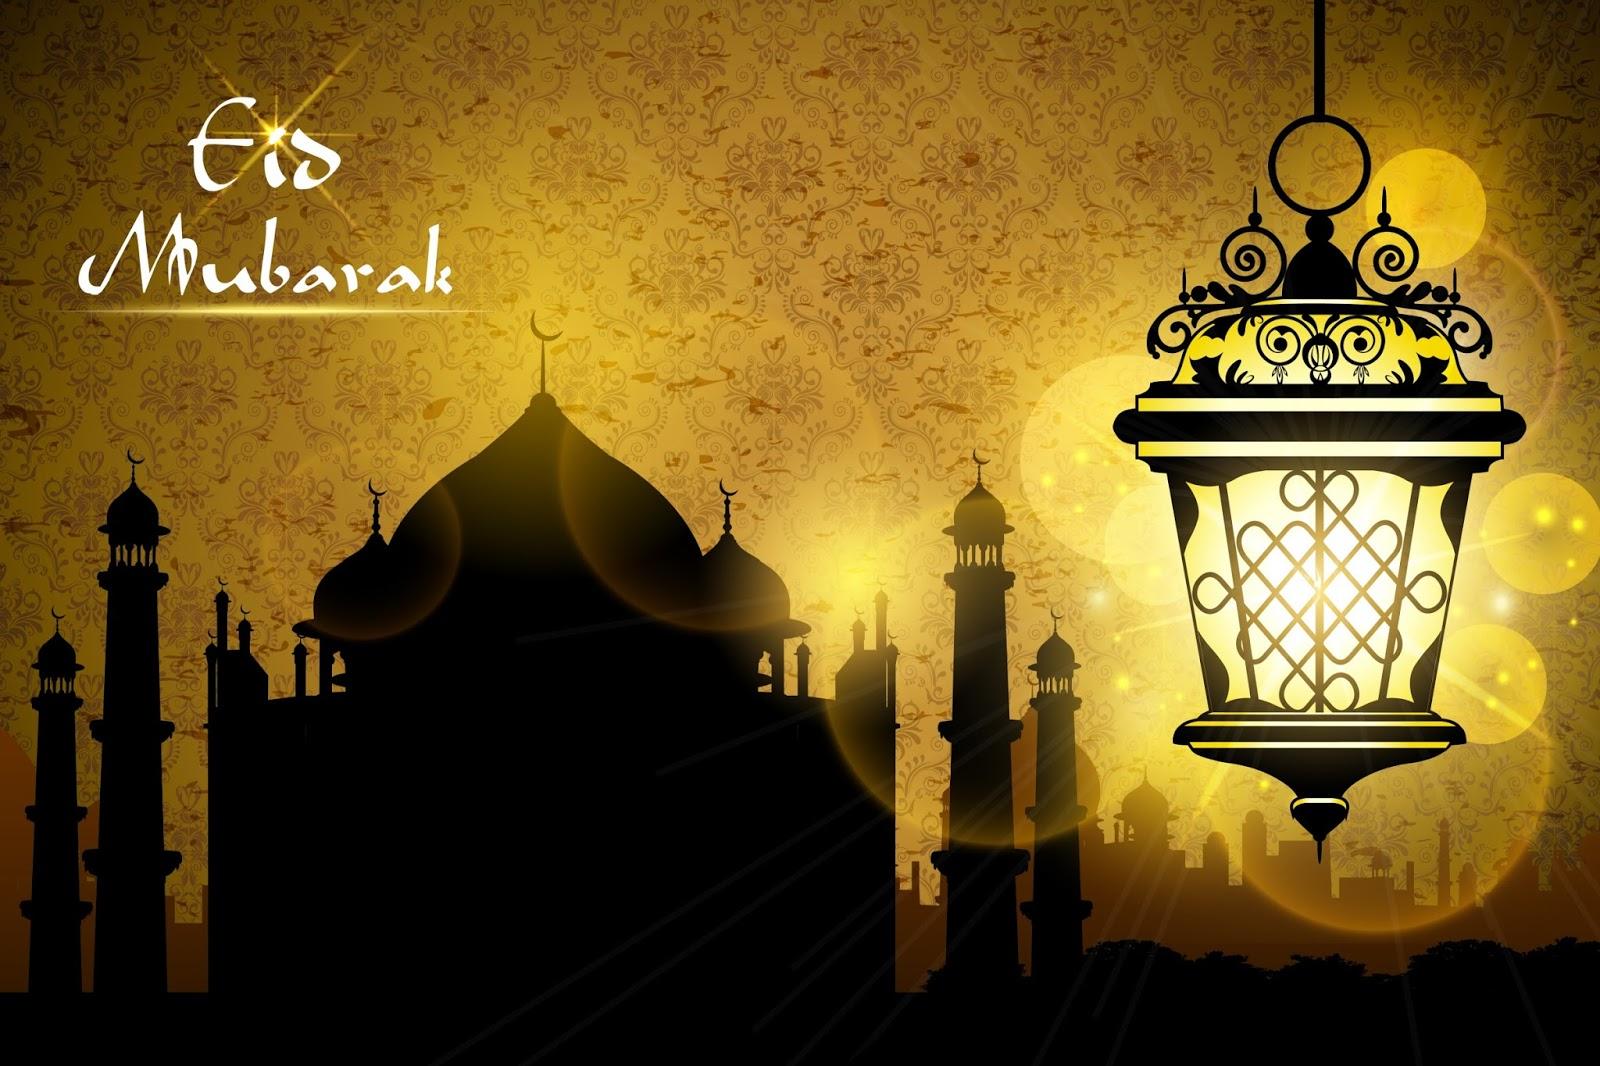 Eid mubarak wishes images Free Download